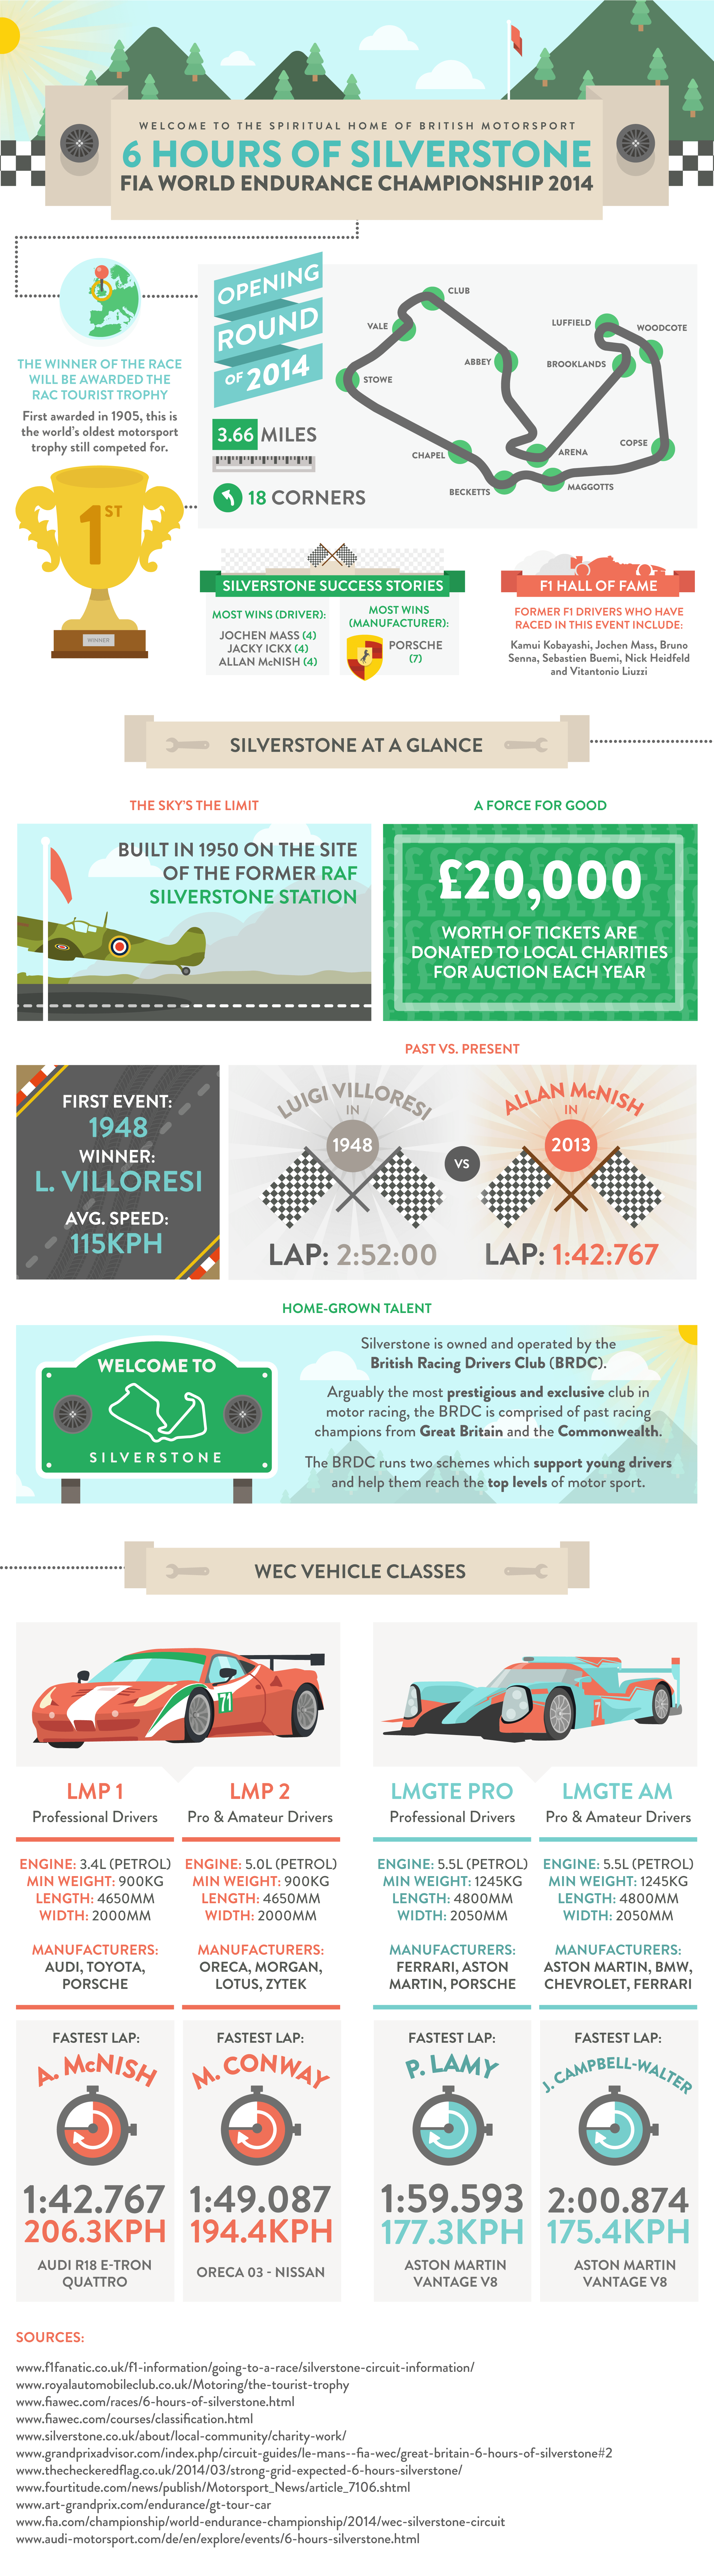 Silverstone Endurance Championship Infographic - Autoglass®